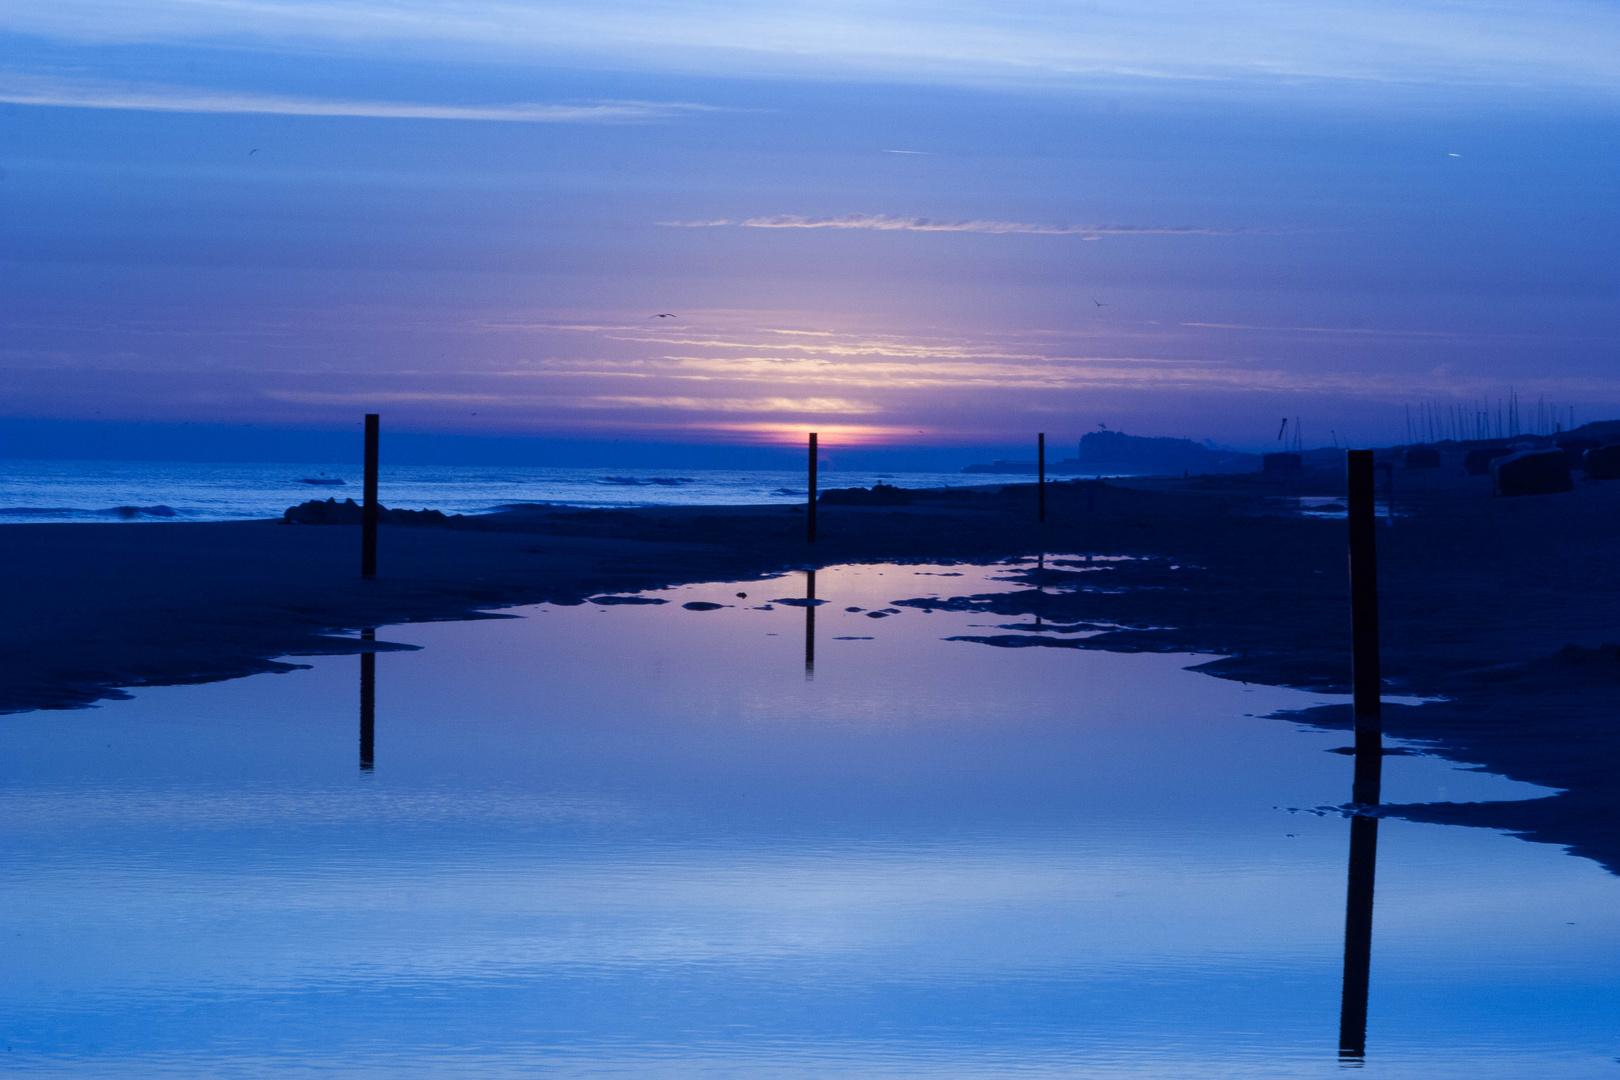 Evening Beach De Haan